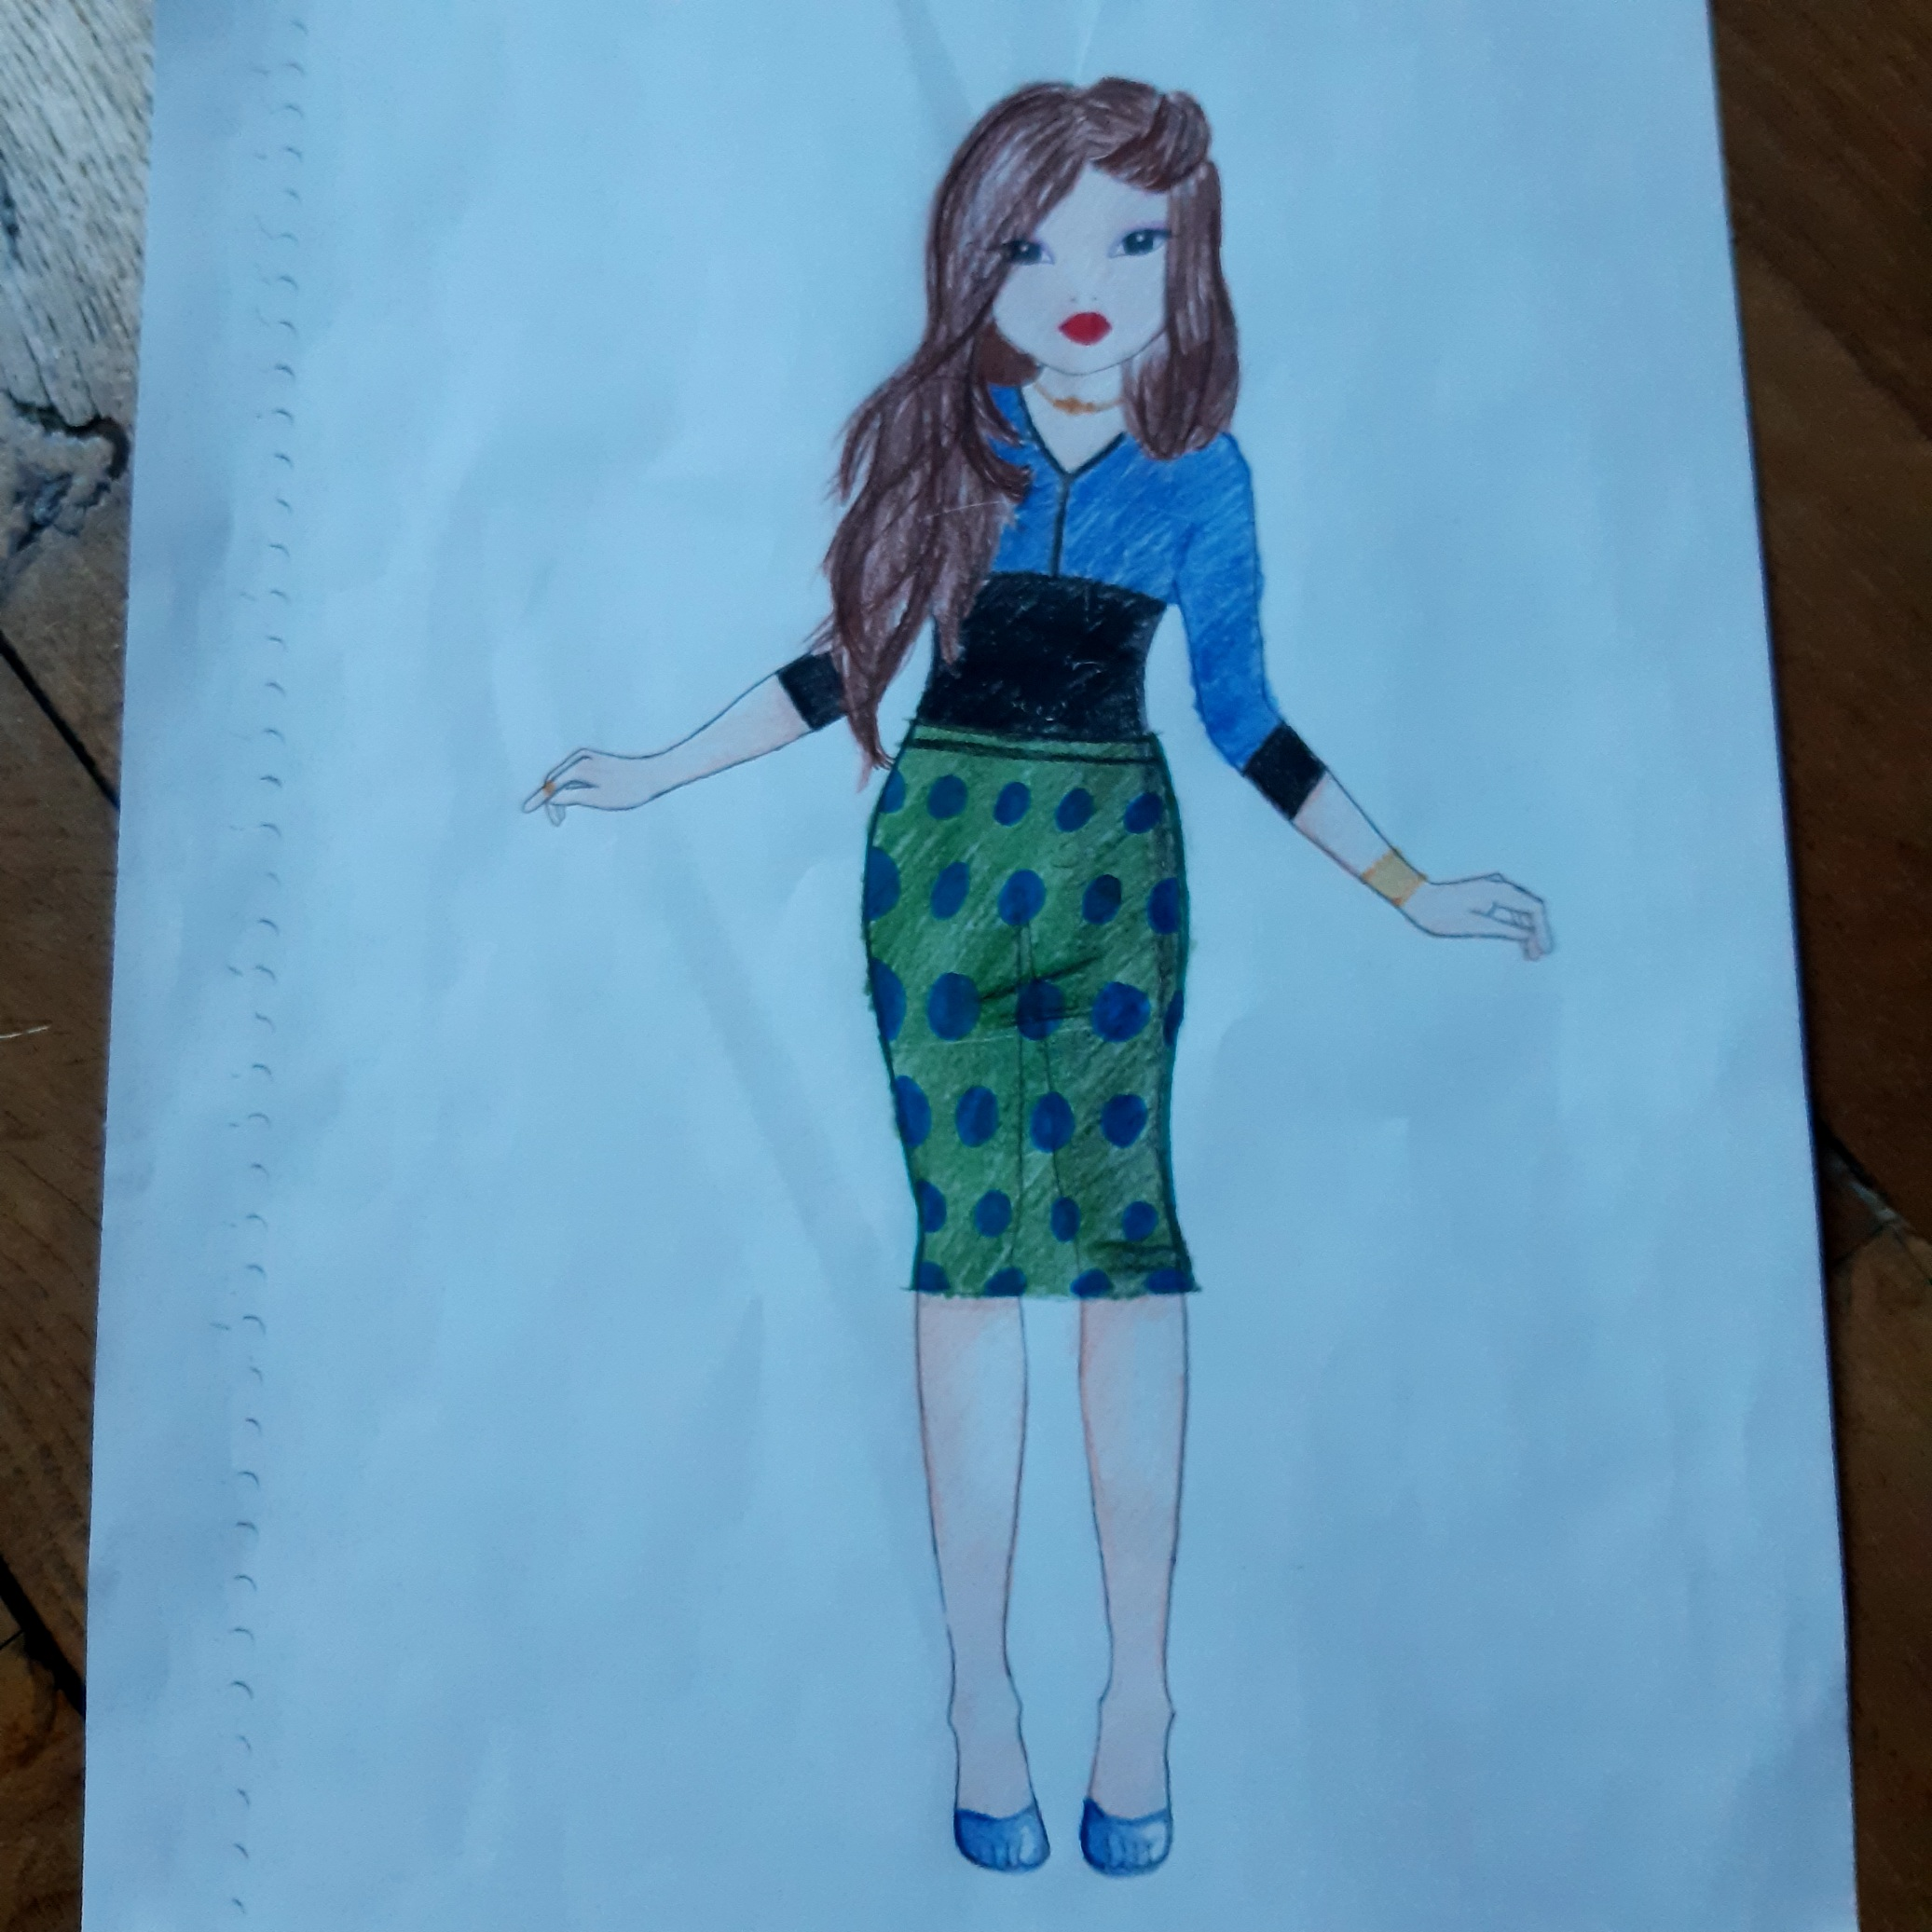 Camille  M., 10 Jahre, aus PARIS